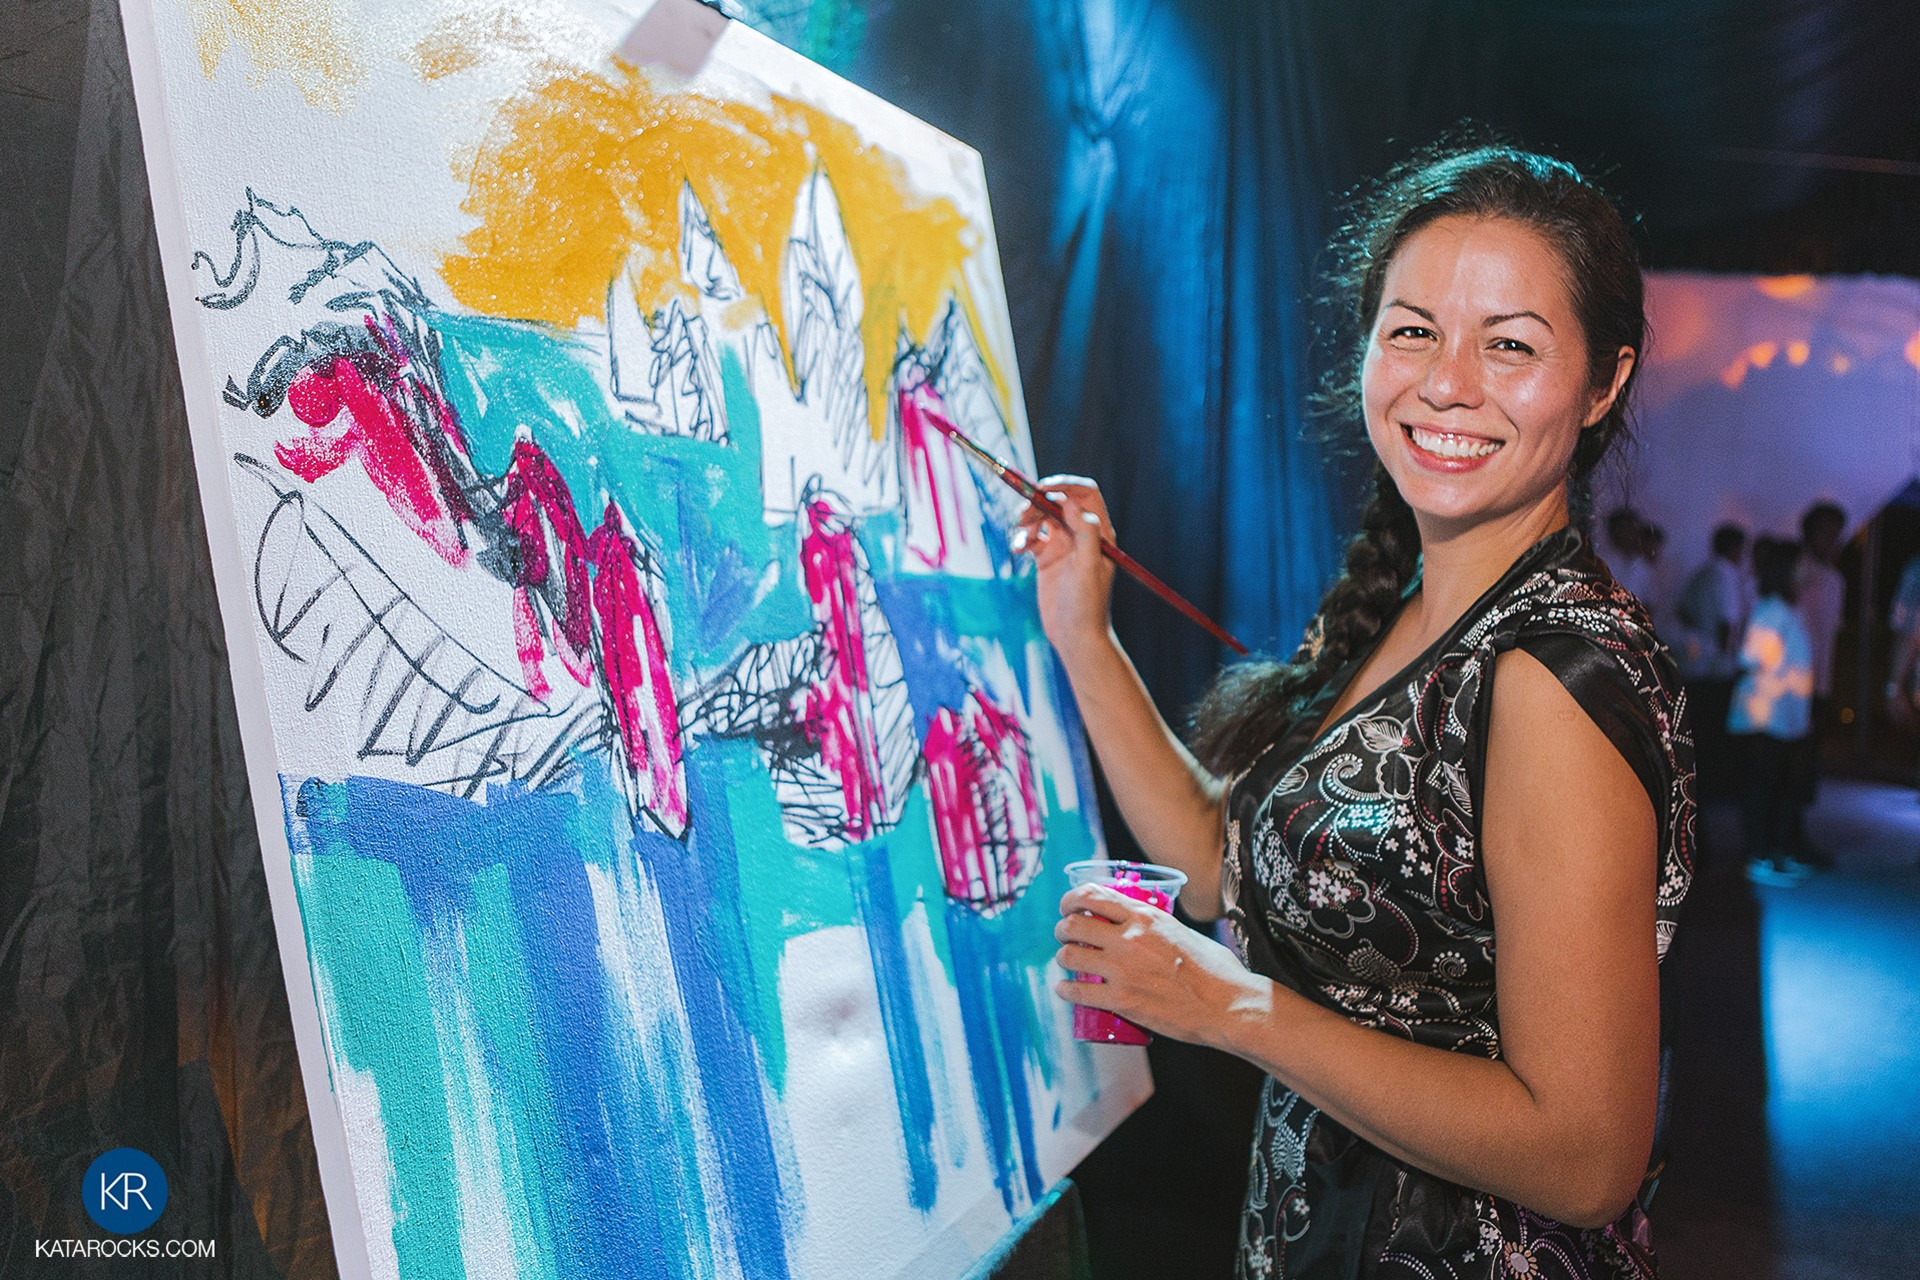 Kata Rocks Pops Up at Phuket Has Been Good to Us - Phuket Charity event paint